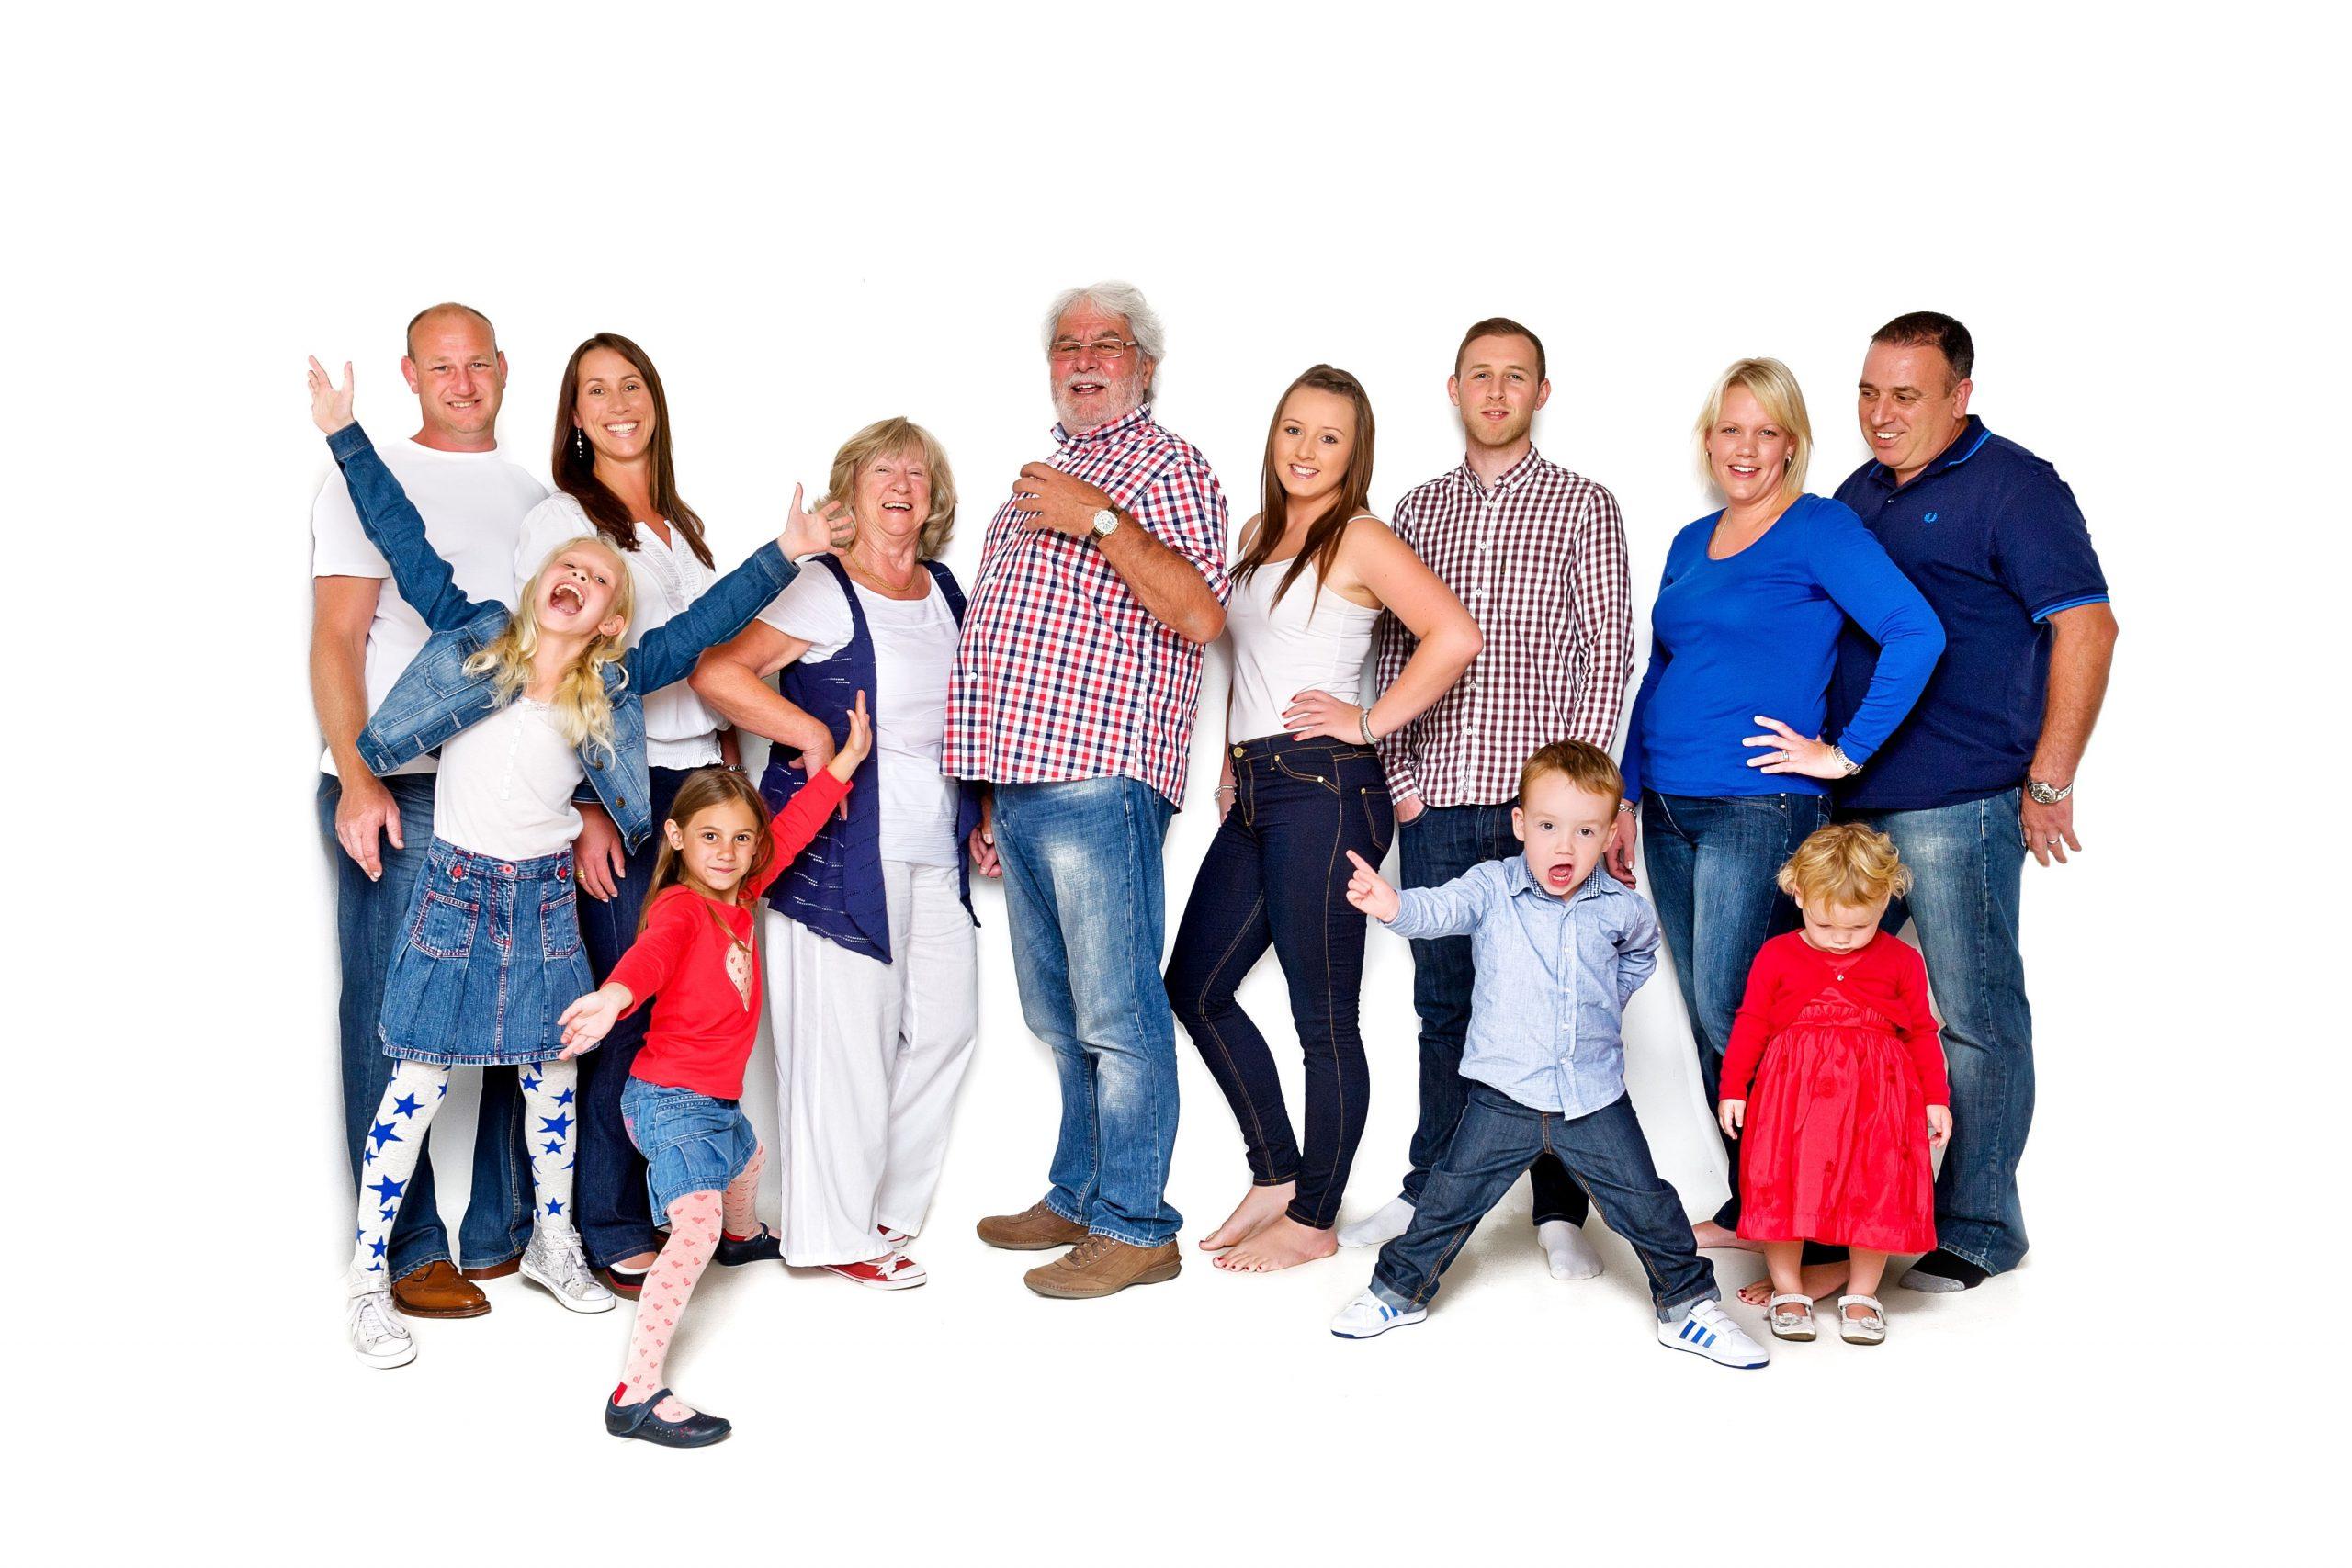 family portrait photographers herne bay kent